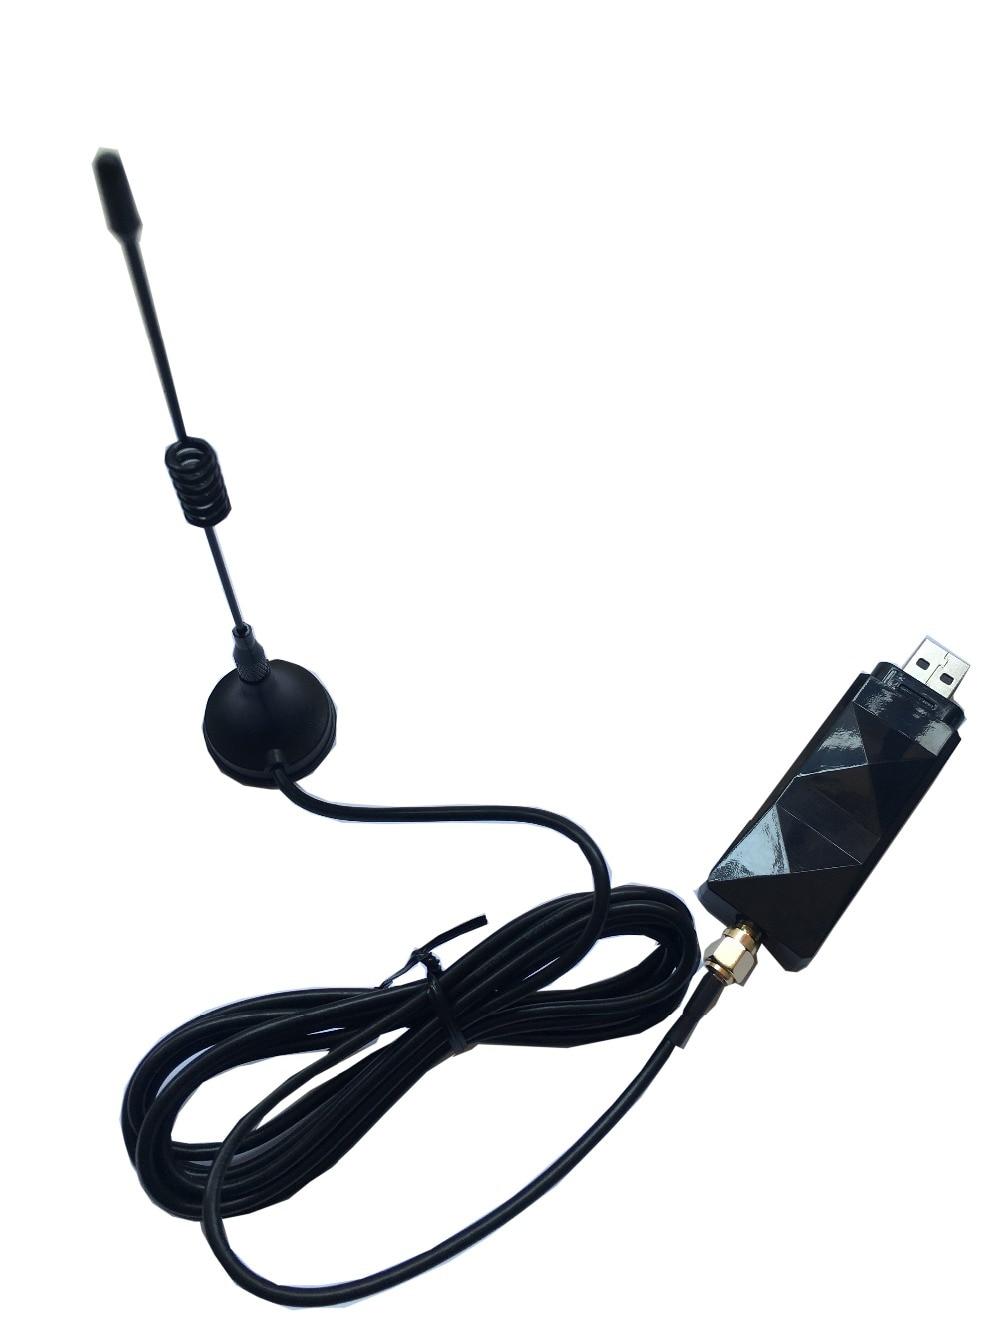 USB Pocsag החלפה מערכת מהדר/משדר, הזמנות אלחוטית/תורים מערכת אות מגבר, RS232 פרוטוקול,